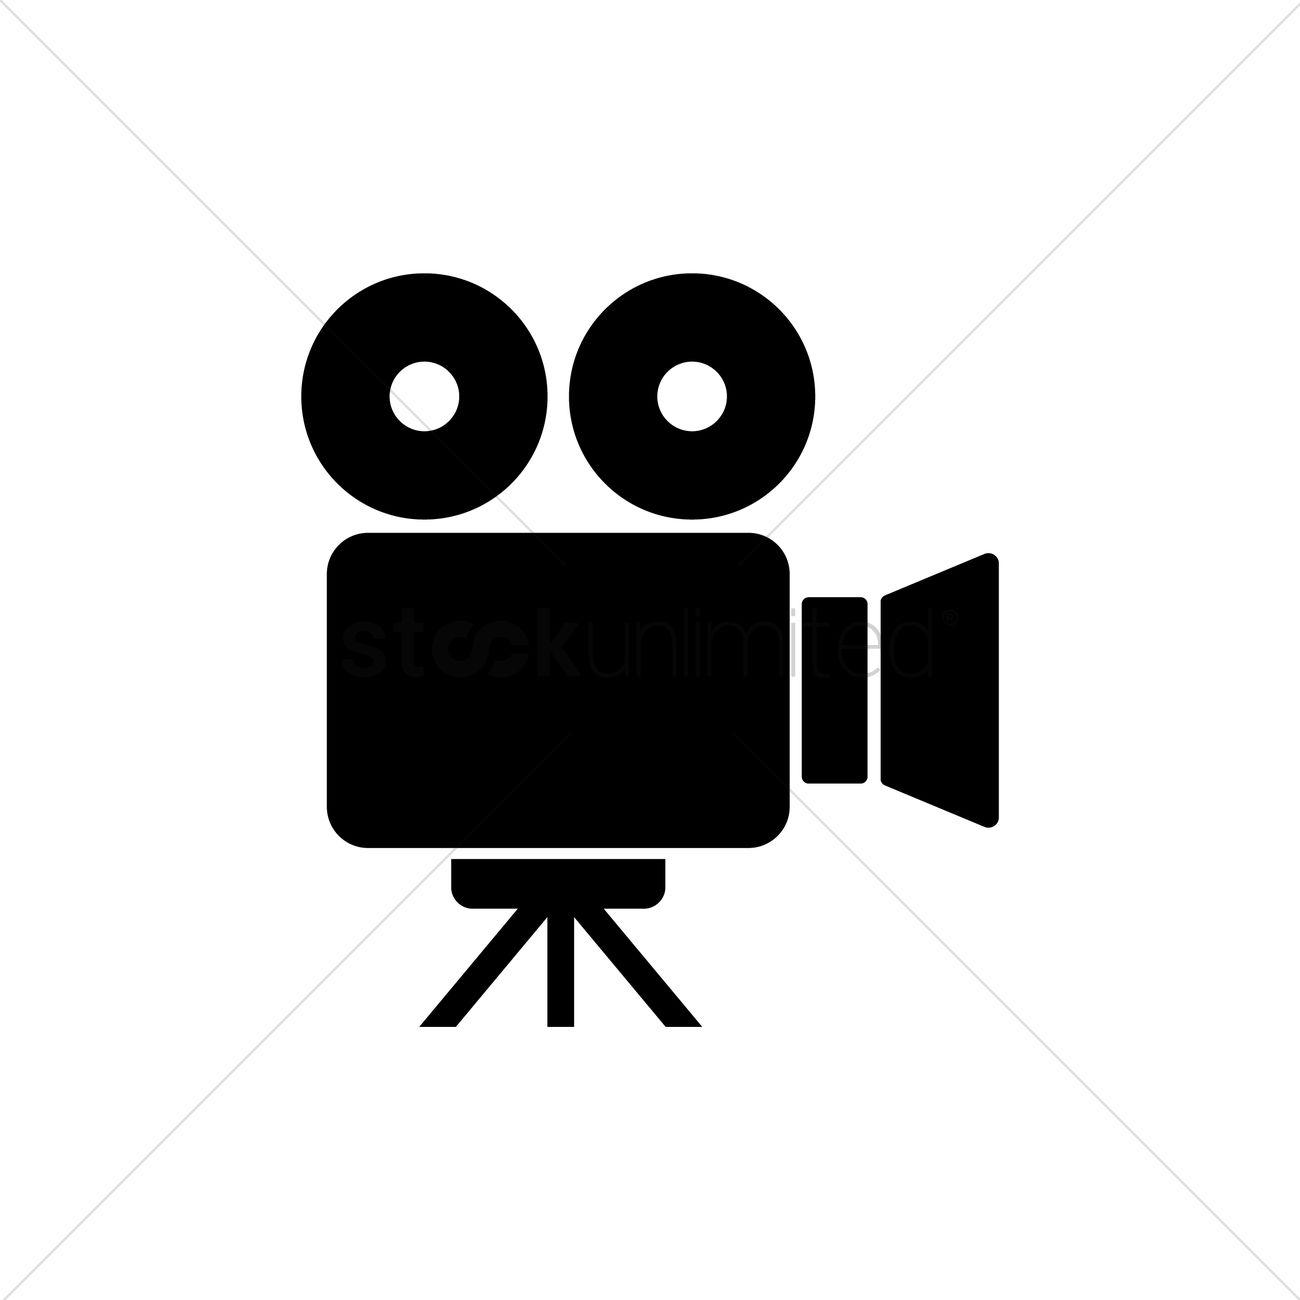 video camera icon vector image 1992293 stockunlimited rh stockunlimited com clipart video camera icon video camera clipart black and white